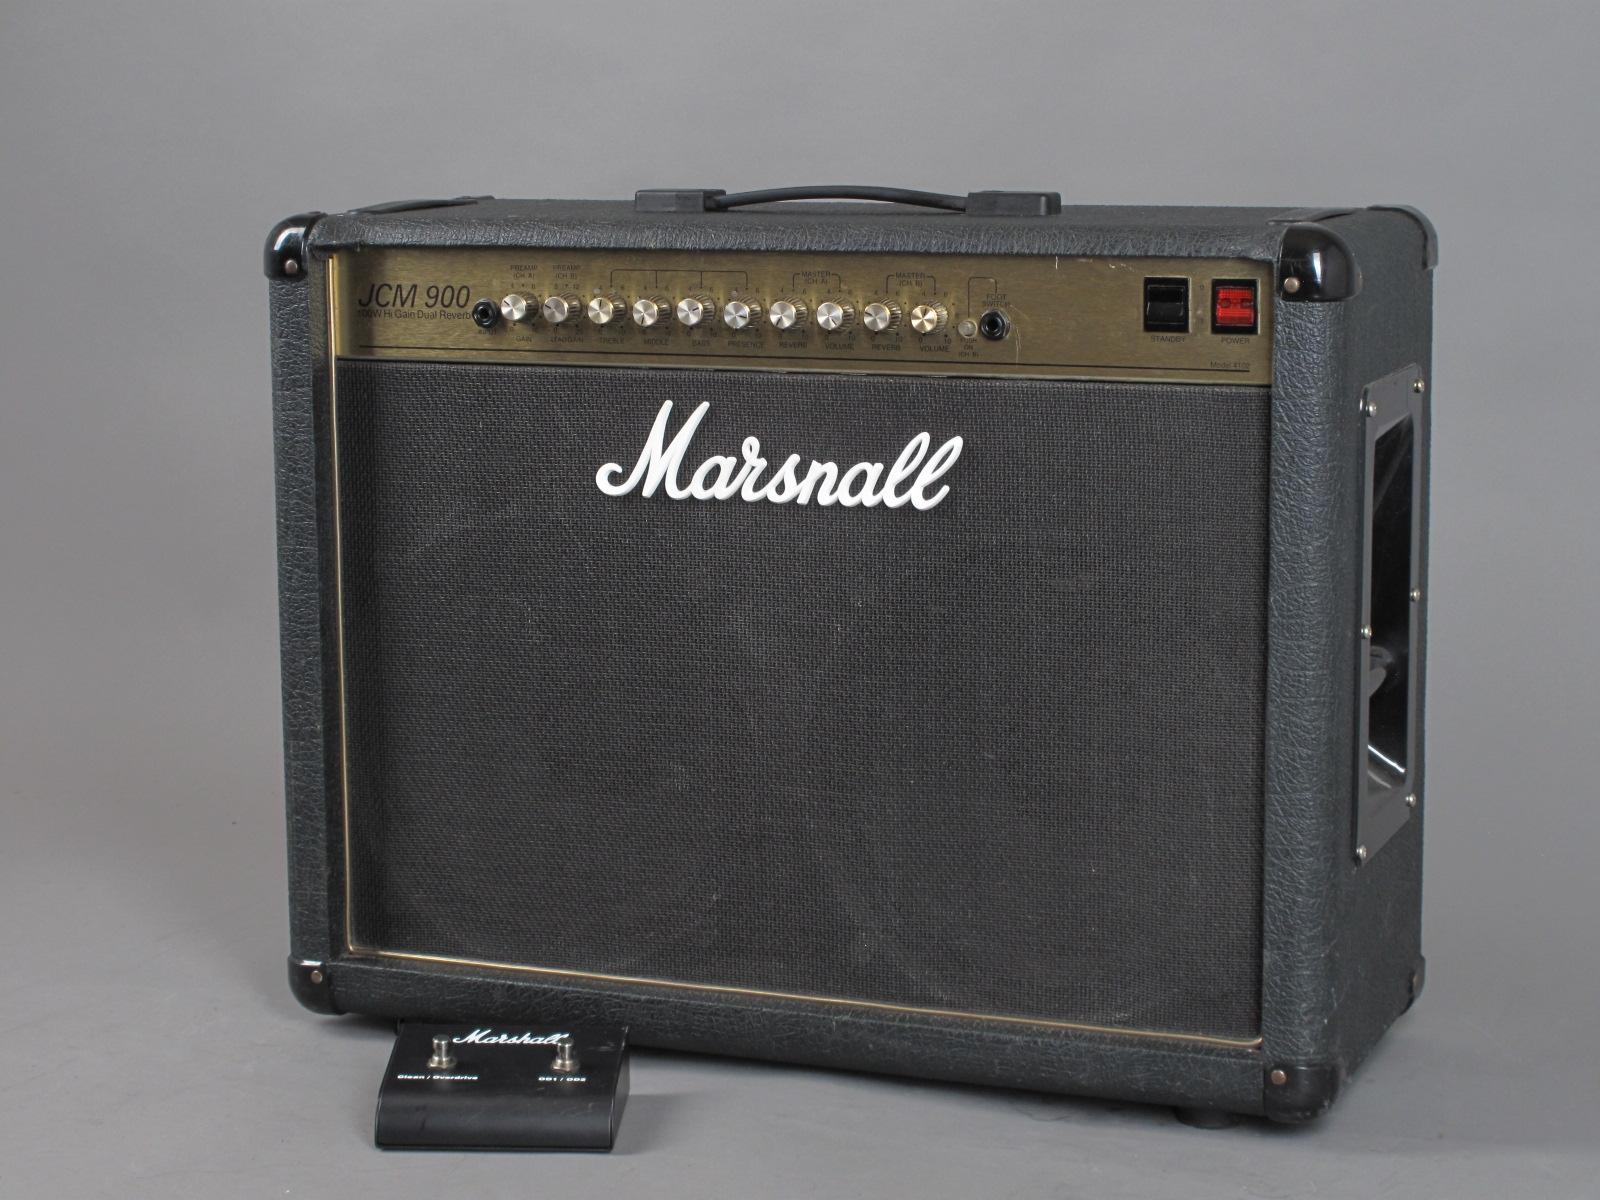 https://guitarpoint.de/app/uploads/products/1994-marshall-jcm900-higain-dual-reverb-combo-100-watt/1994-Marshall-JCM900-4502-3646250_2.jpg